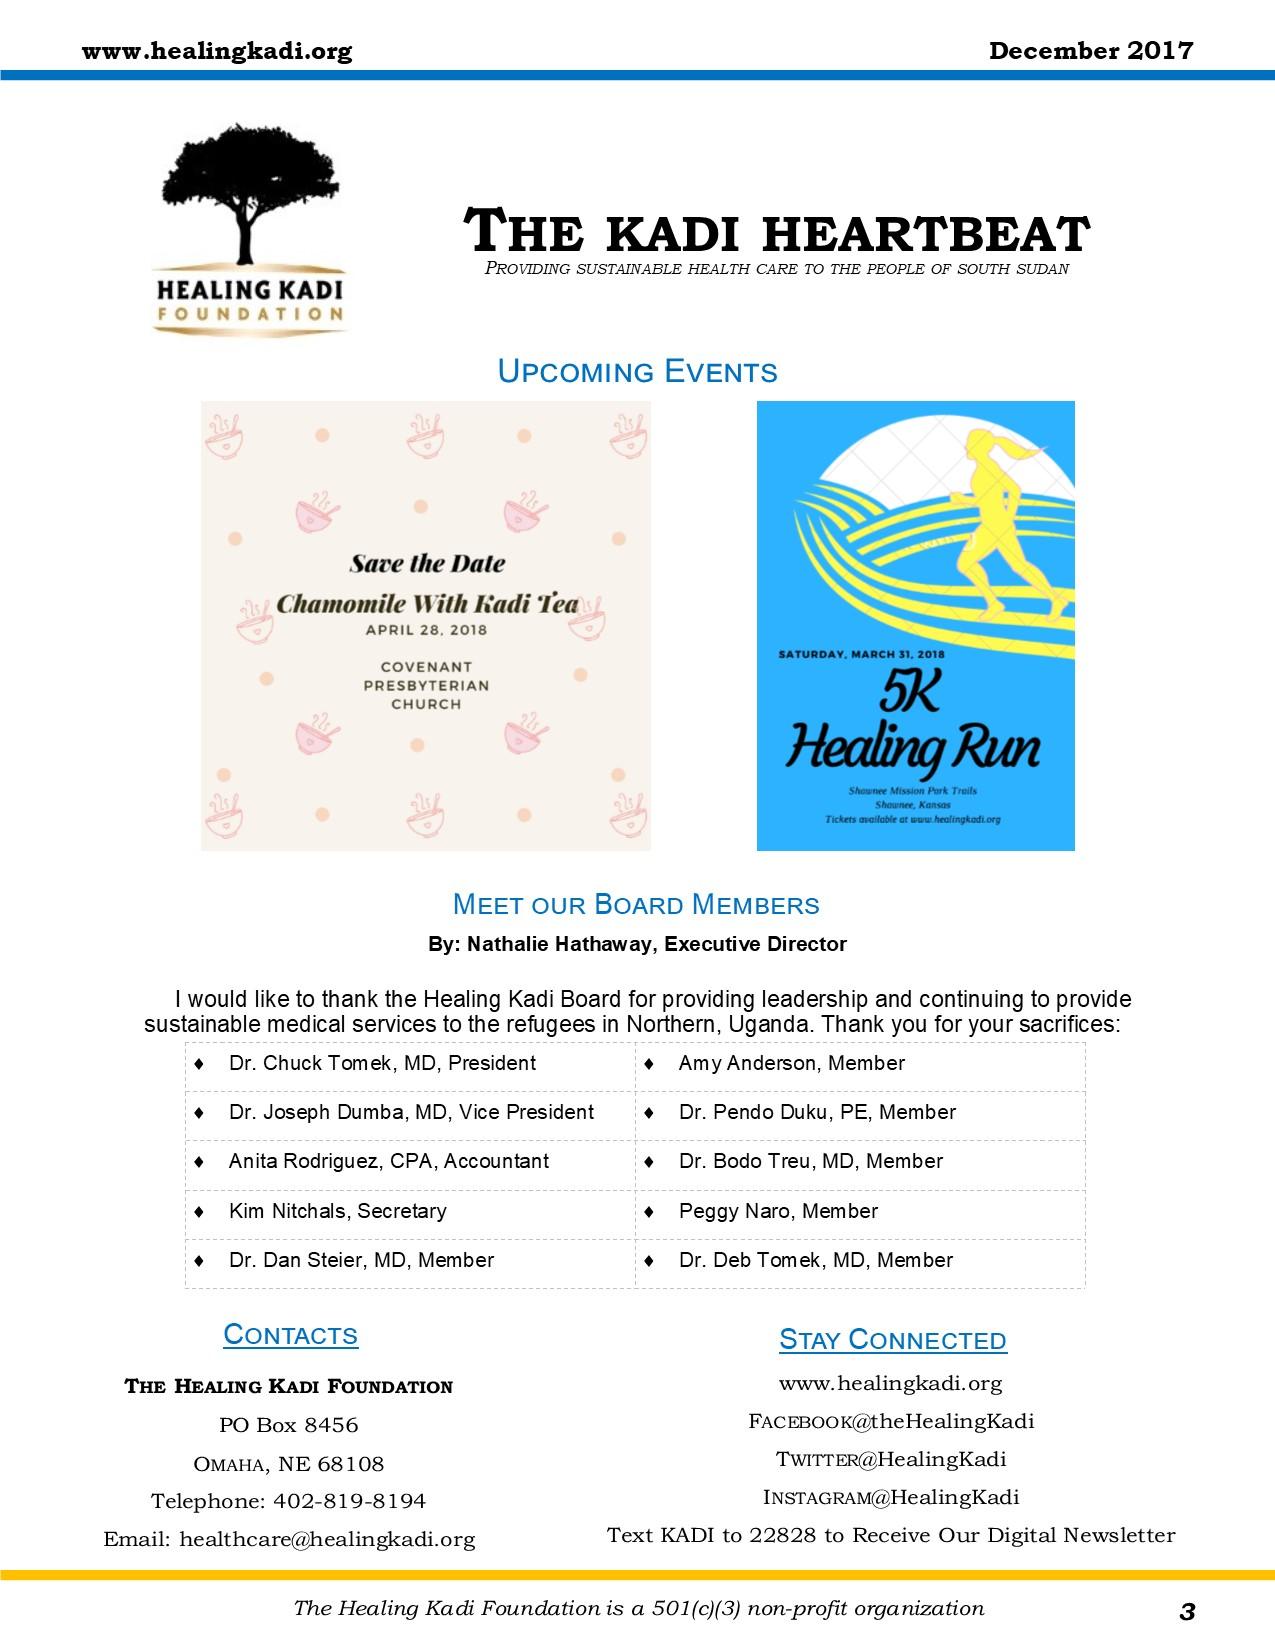 The Kadi Beat_December_9_2017-p3.jpg